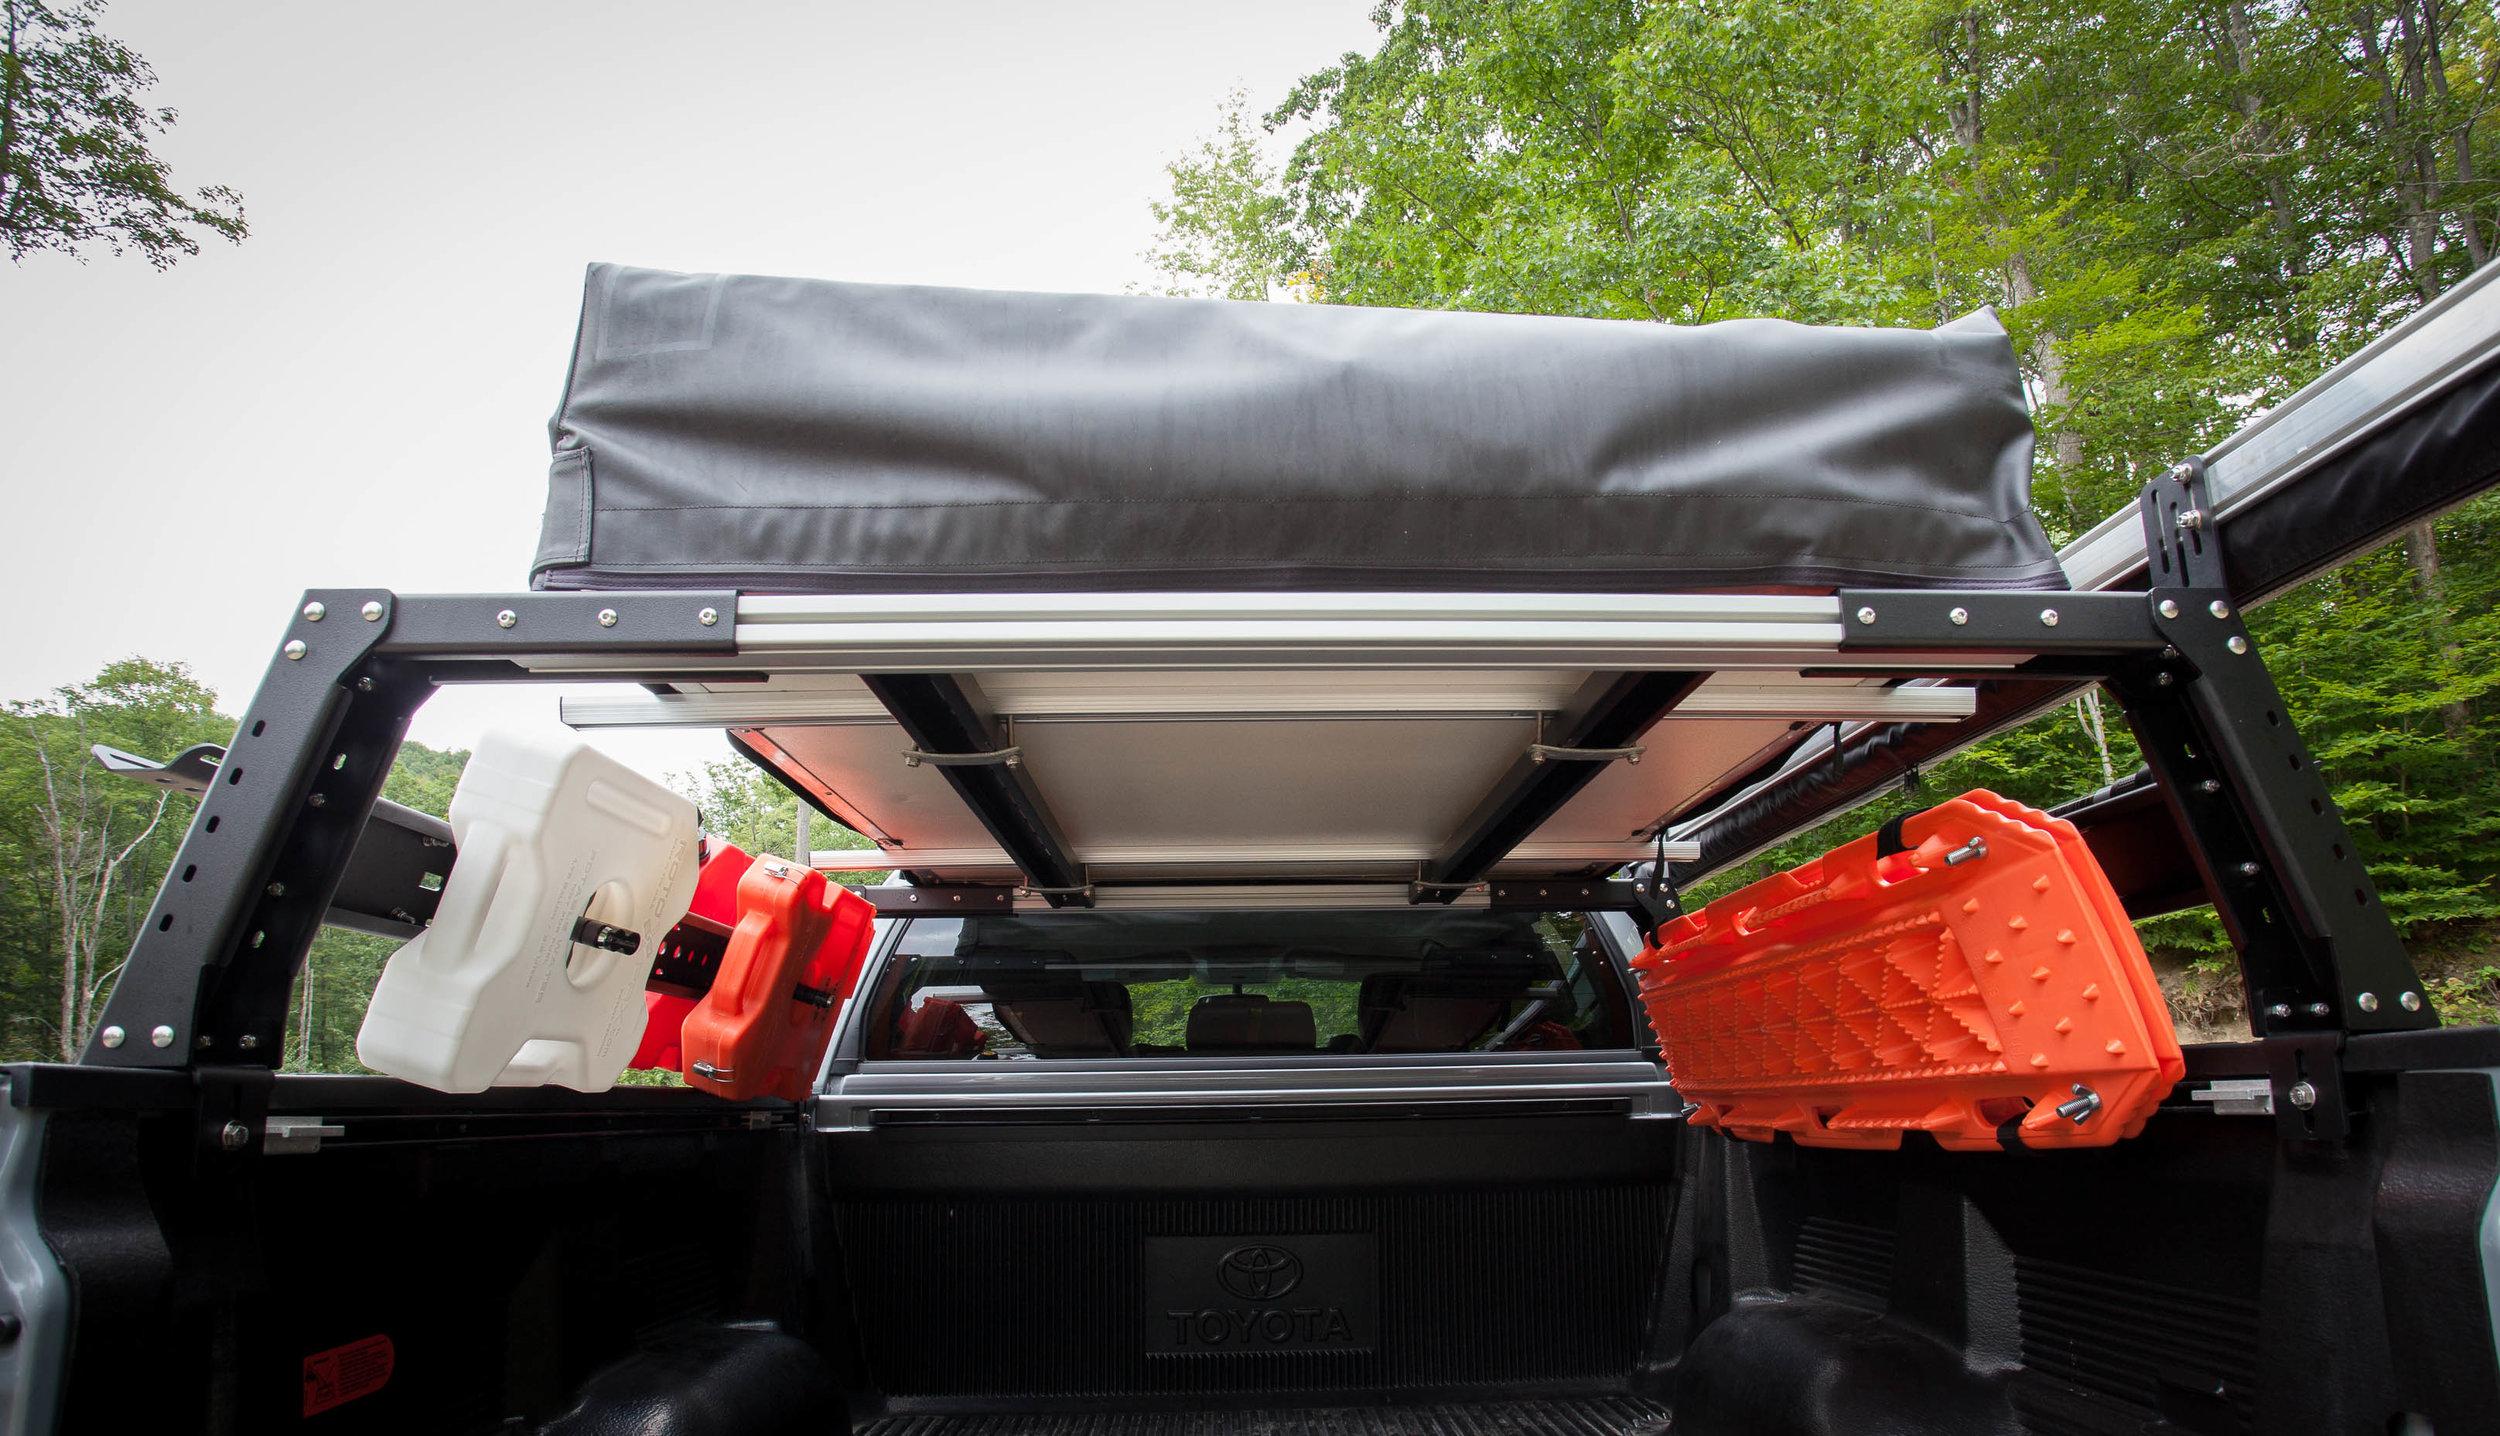 max modular alumax 14 high aluminum bed rack fits all toyota ford chevy ram and nissan trucks max modular truck bed racks